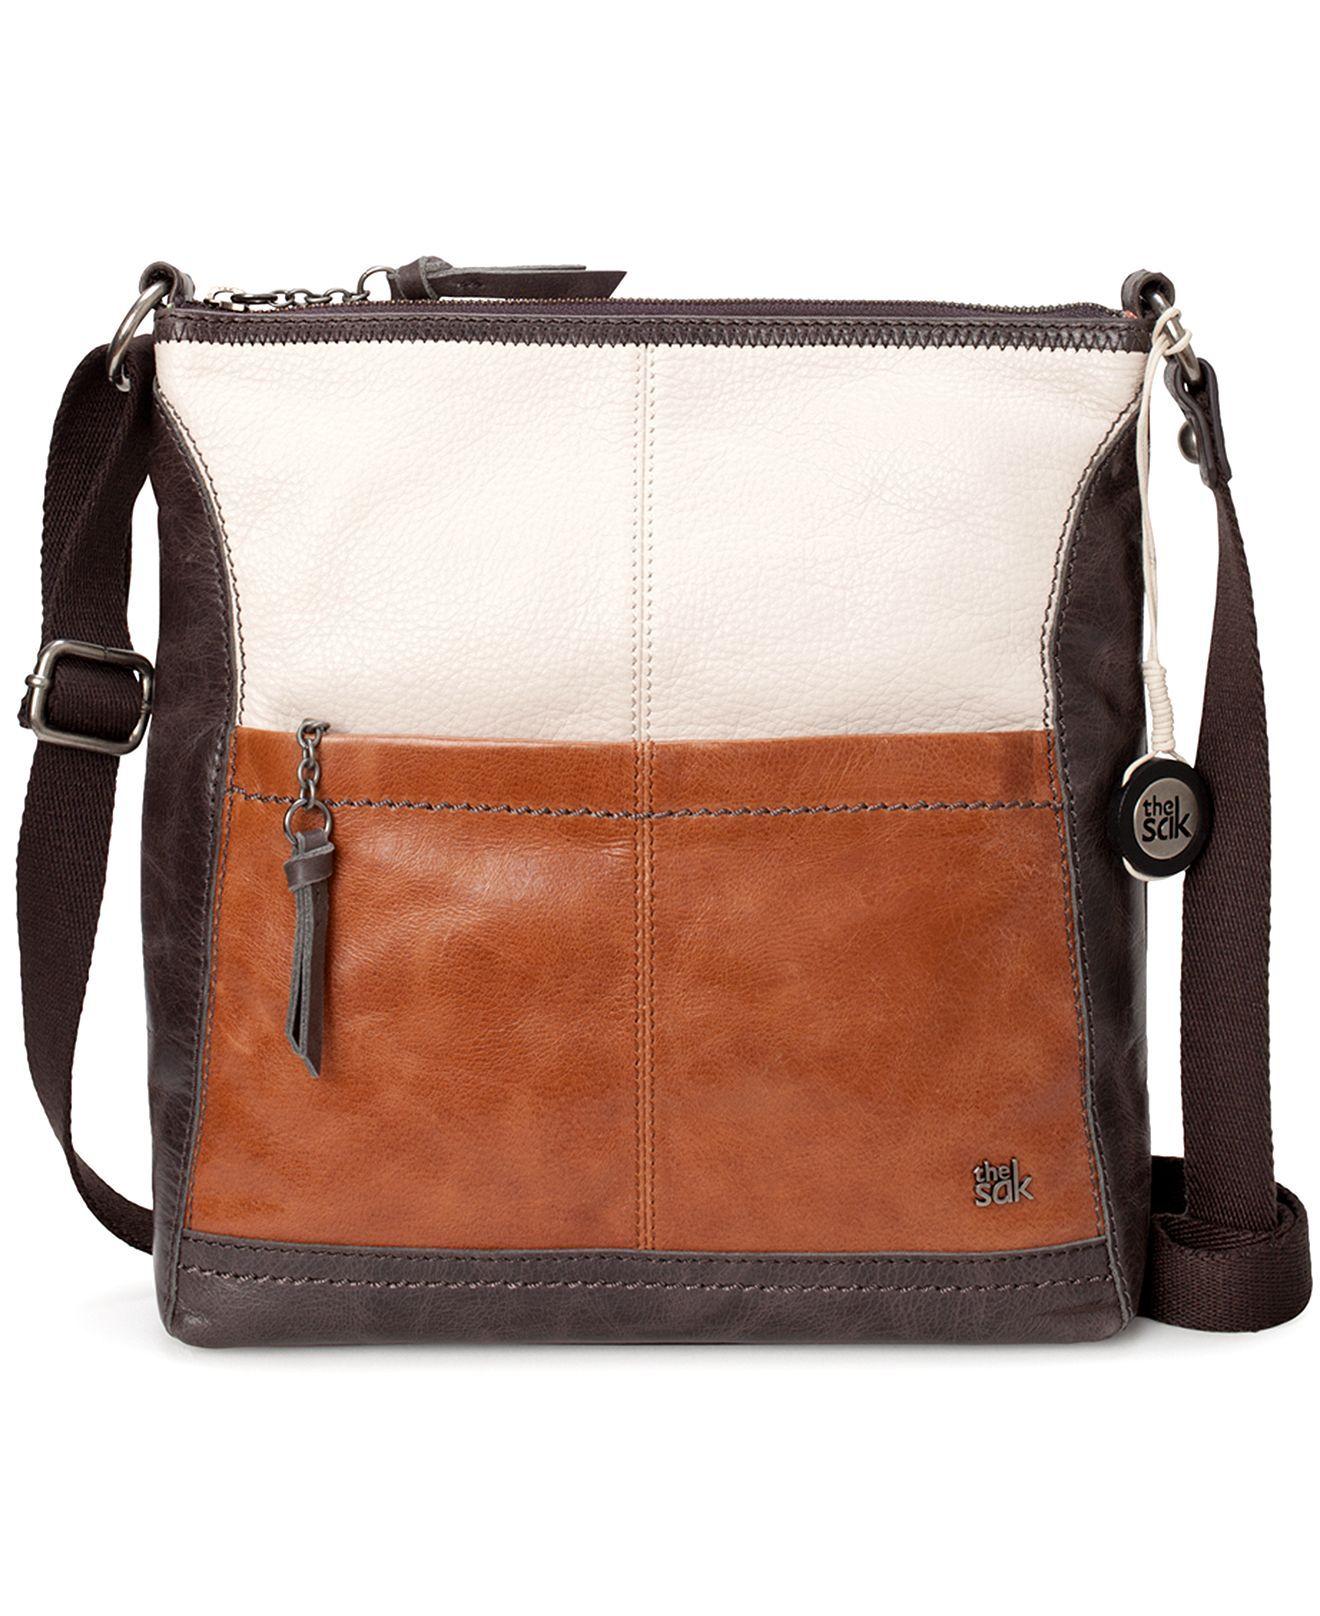 The Sak Handbag Iris Leather Crossbody Bag Clearance Handbags Accessories